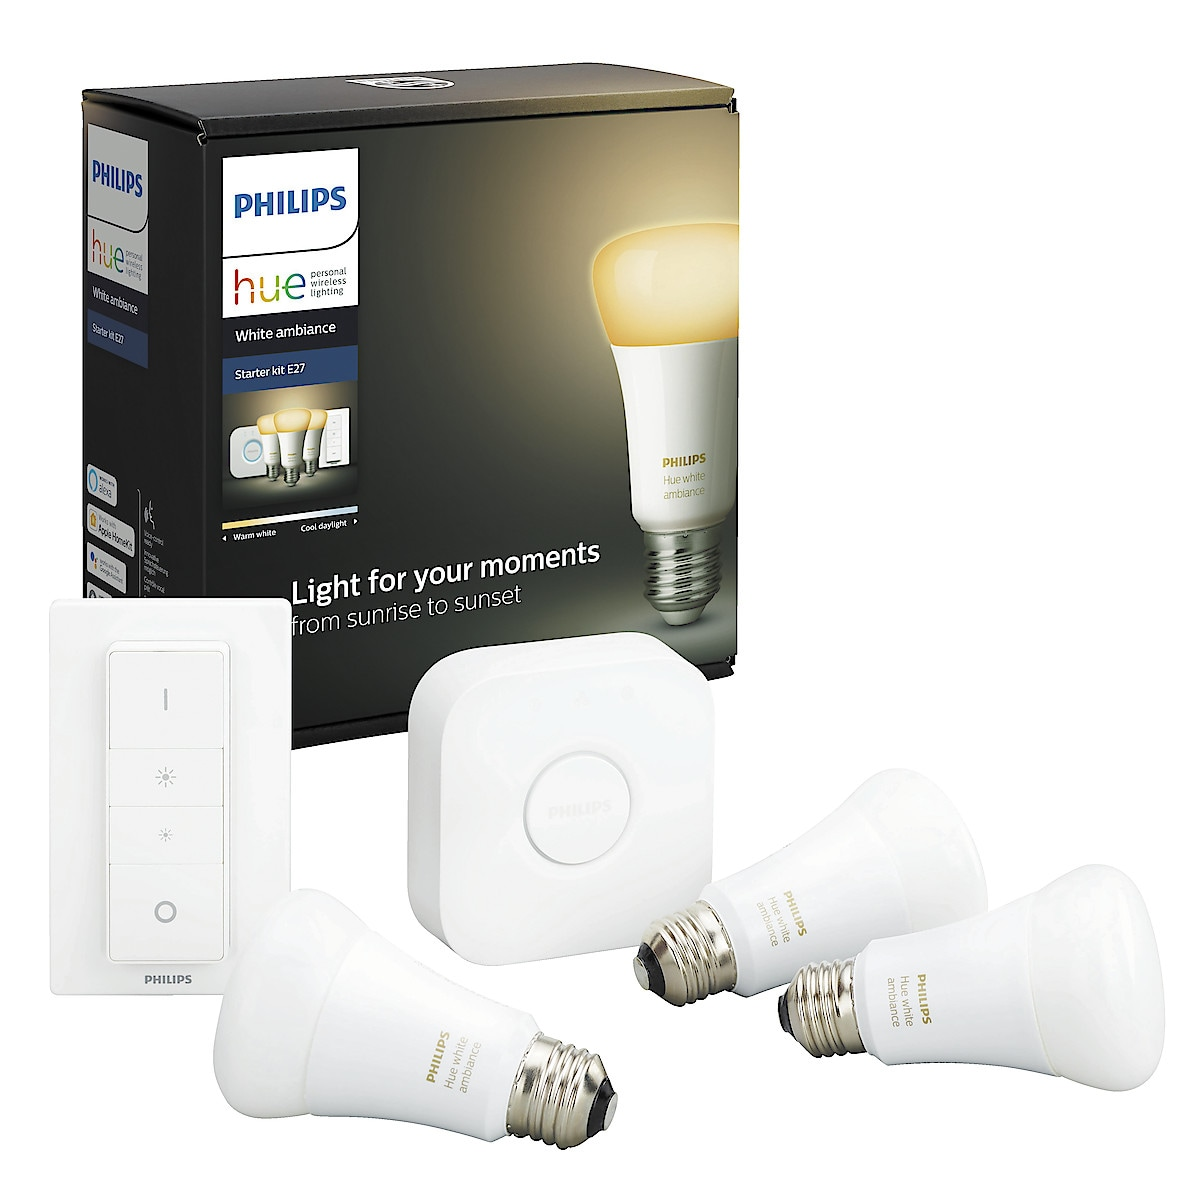 Philips Hue White Ambiance startpaket E27 Bluetooth